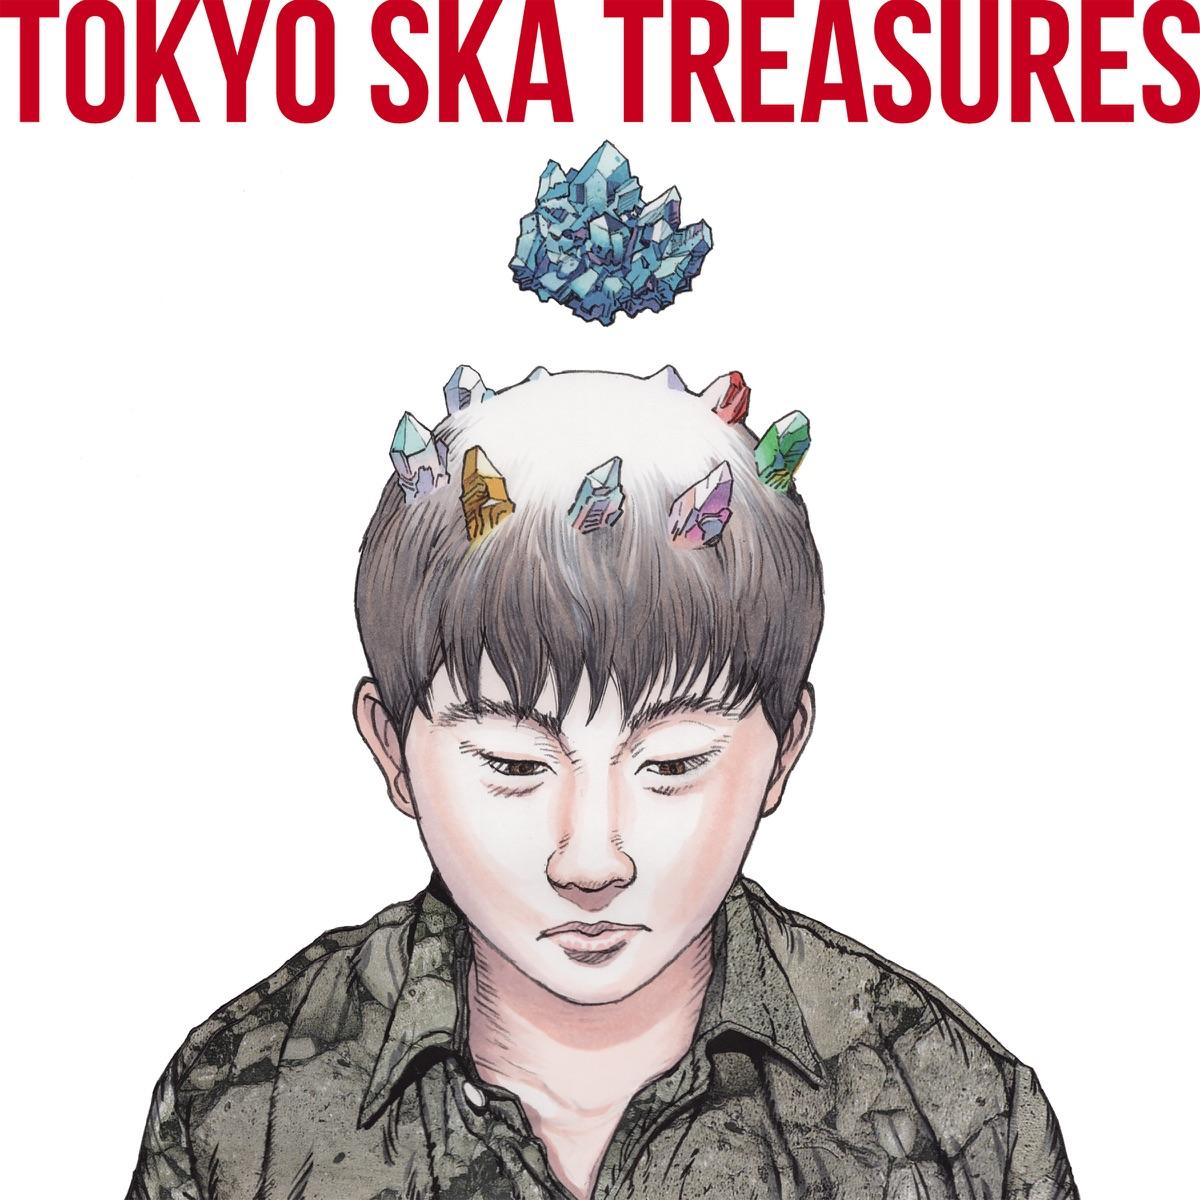 『Good Morning~ブルー・デイジー feat. aiko』収録の『TOKYO SKA TREASURES ~ベスト・オブ・東京スカパラダイスオーケストラ~』ジャケット